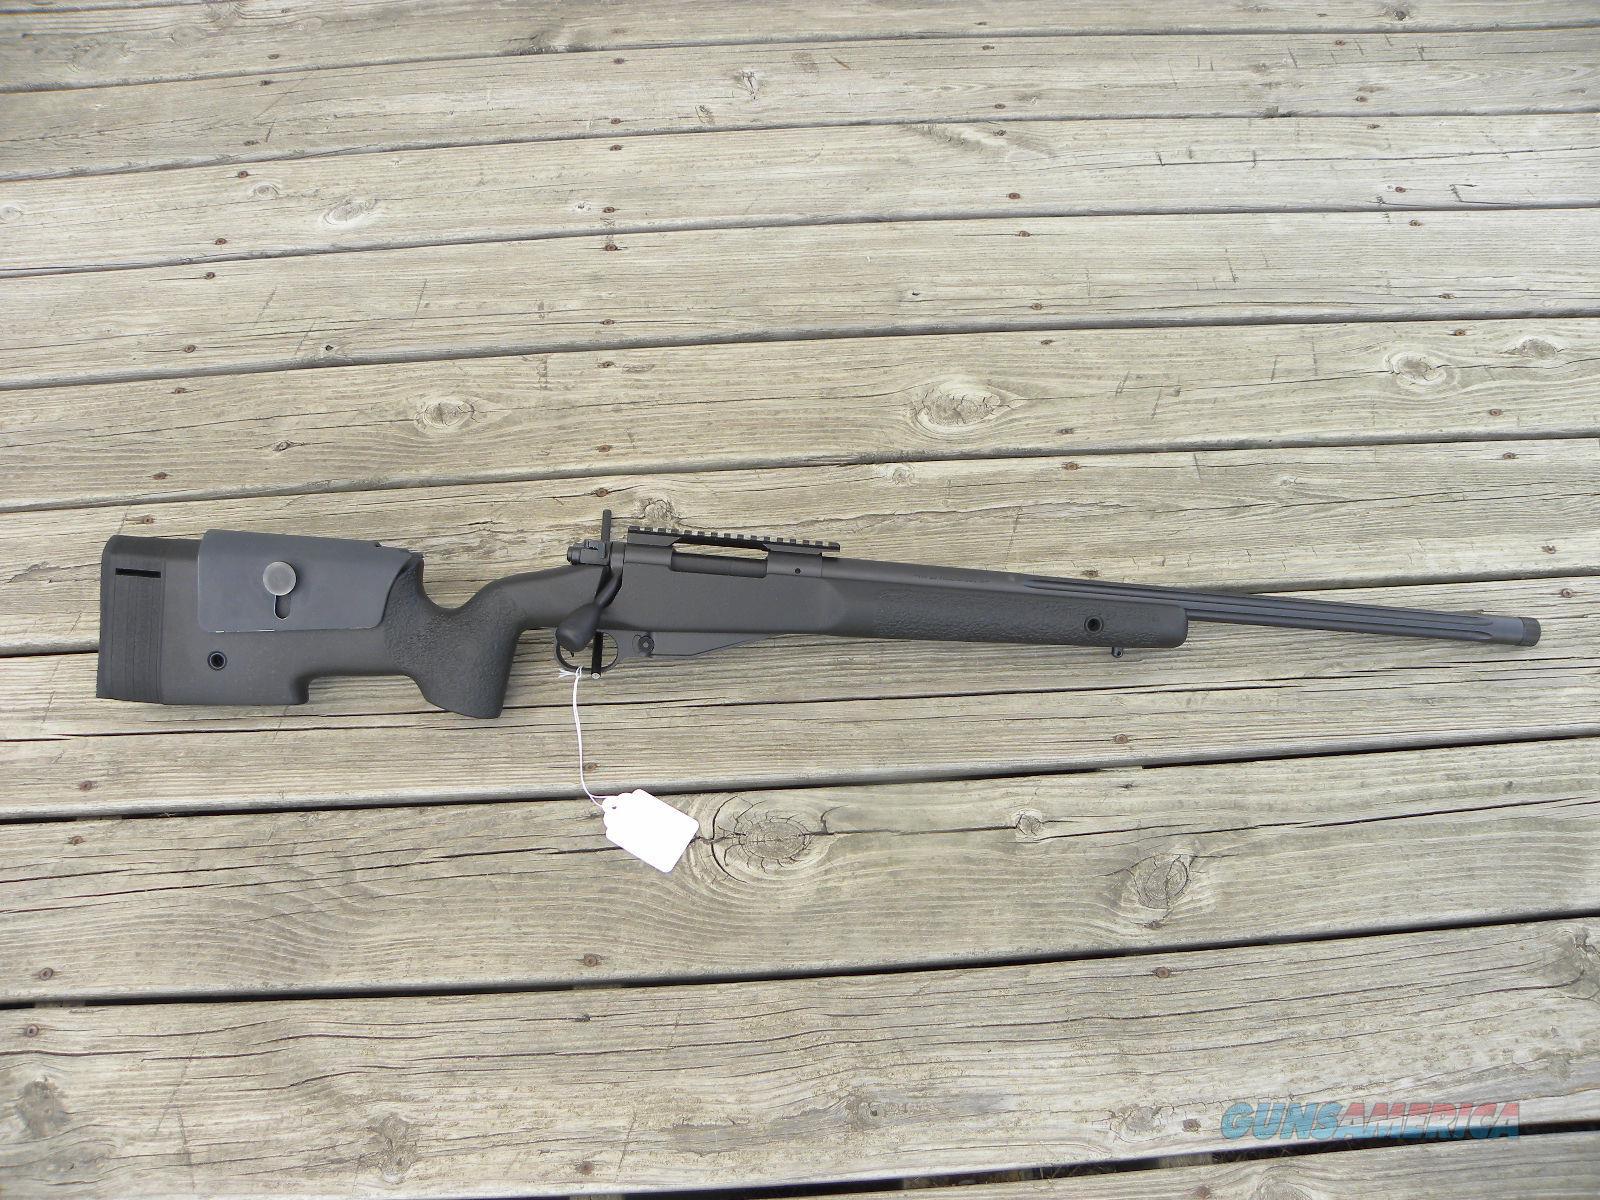 "NIB FNH SPR A5m XP .308 24"" 75638 .71MOA  Guns > Rifles > FNH - Fabrique Nationale (FN) Rifles > Bolt action > Tactical"